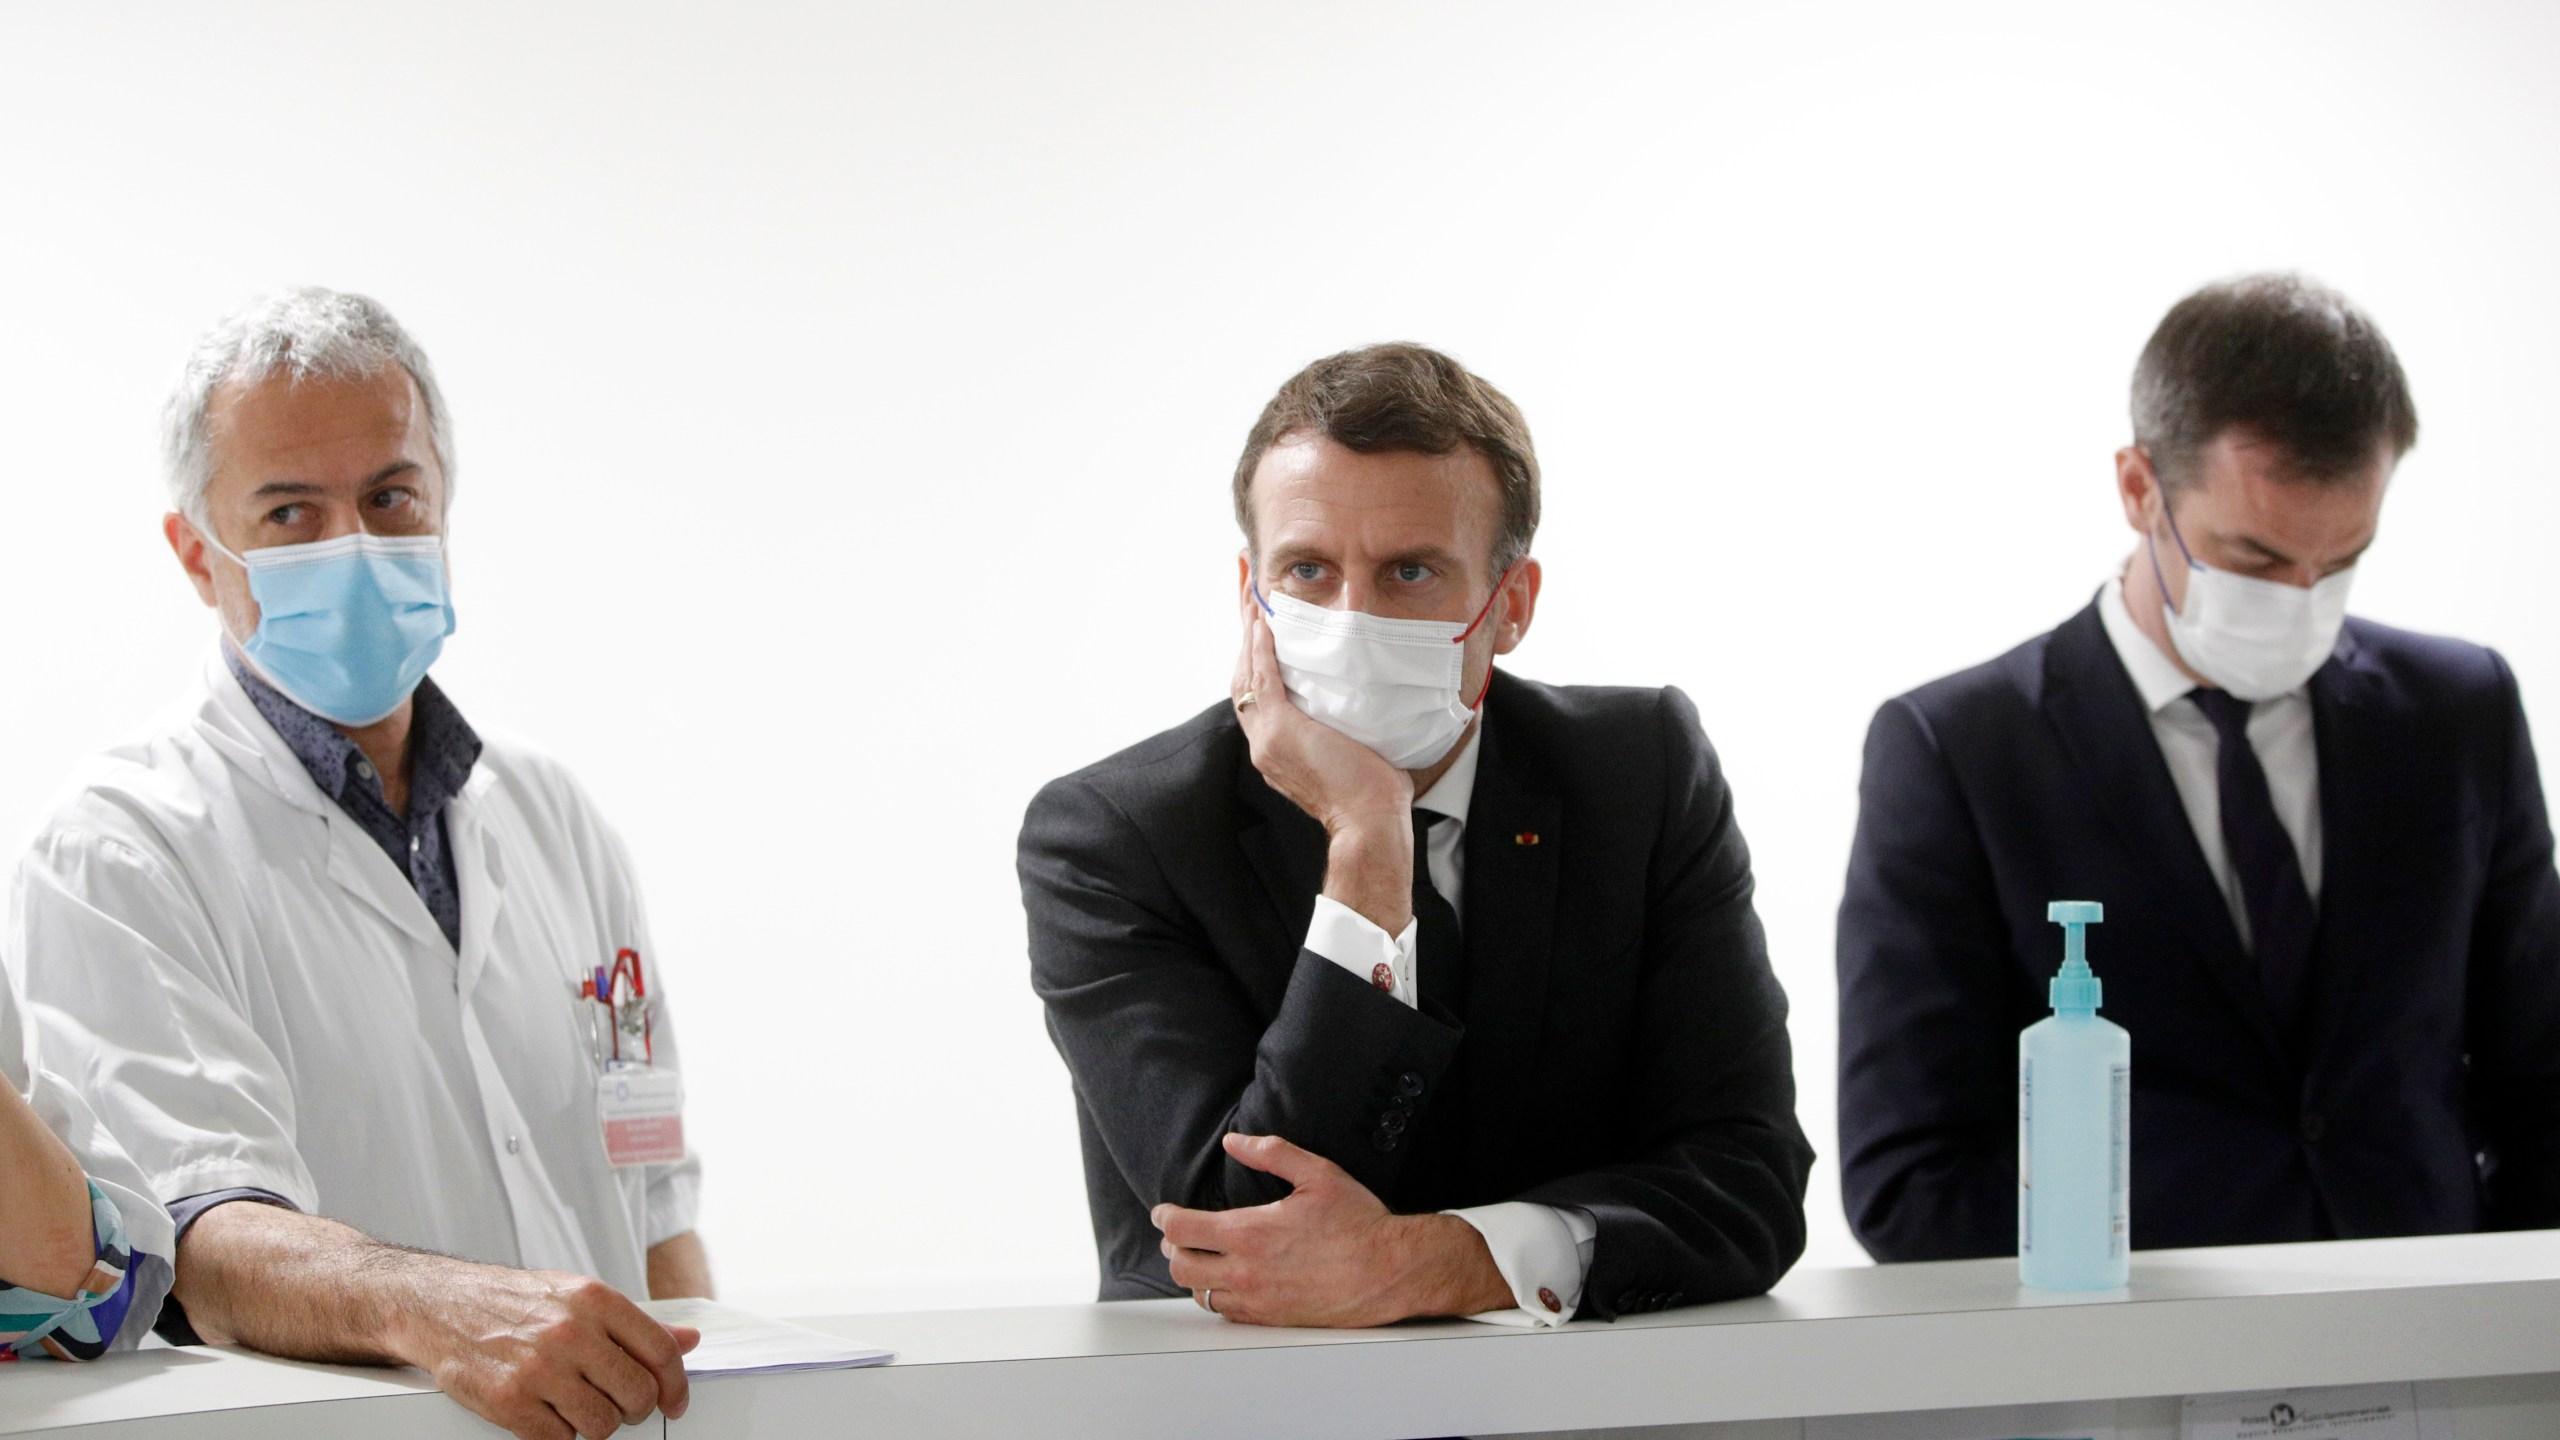 French President Macron visits Poissy/Saint Germain en Laye hospital